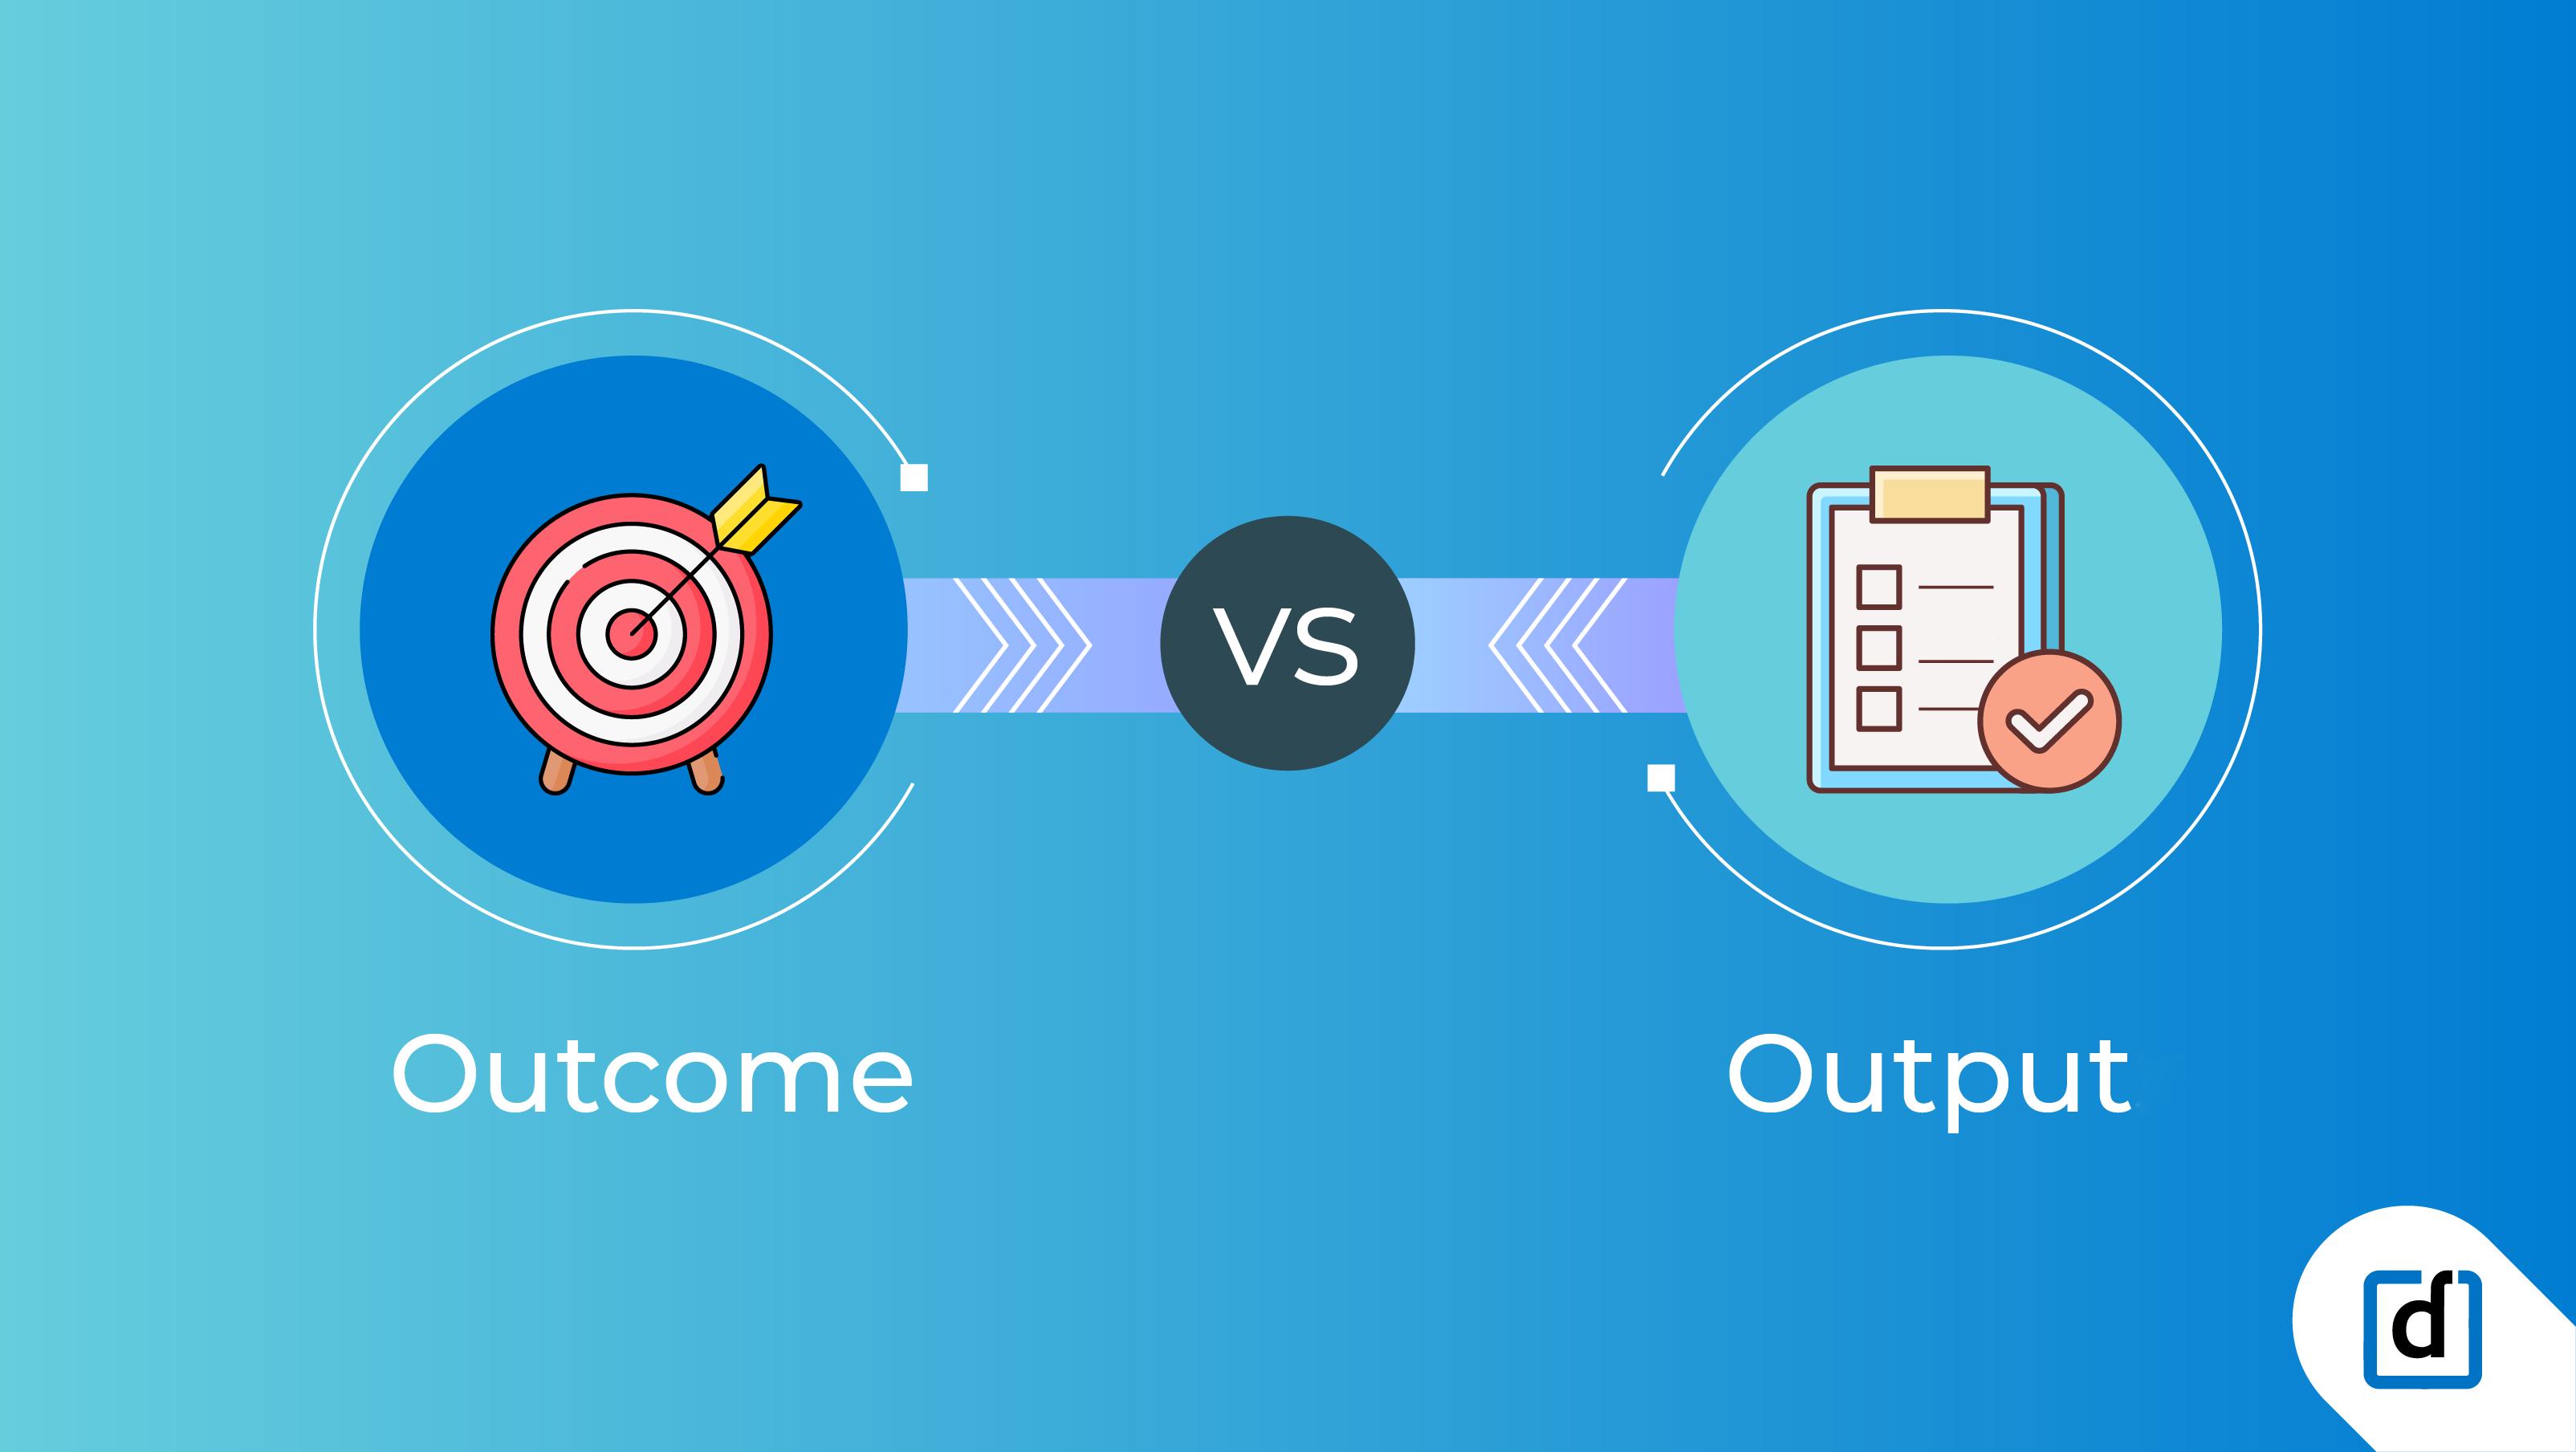 okr-philosophy-outcome-vs-output